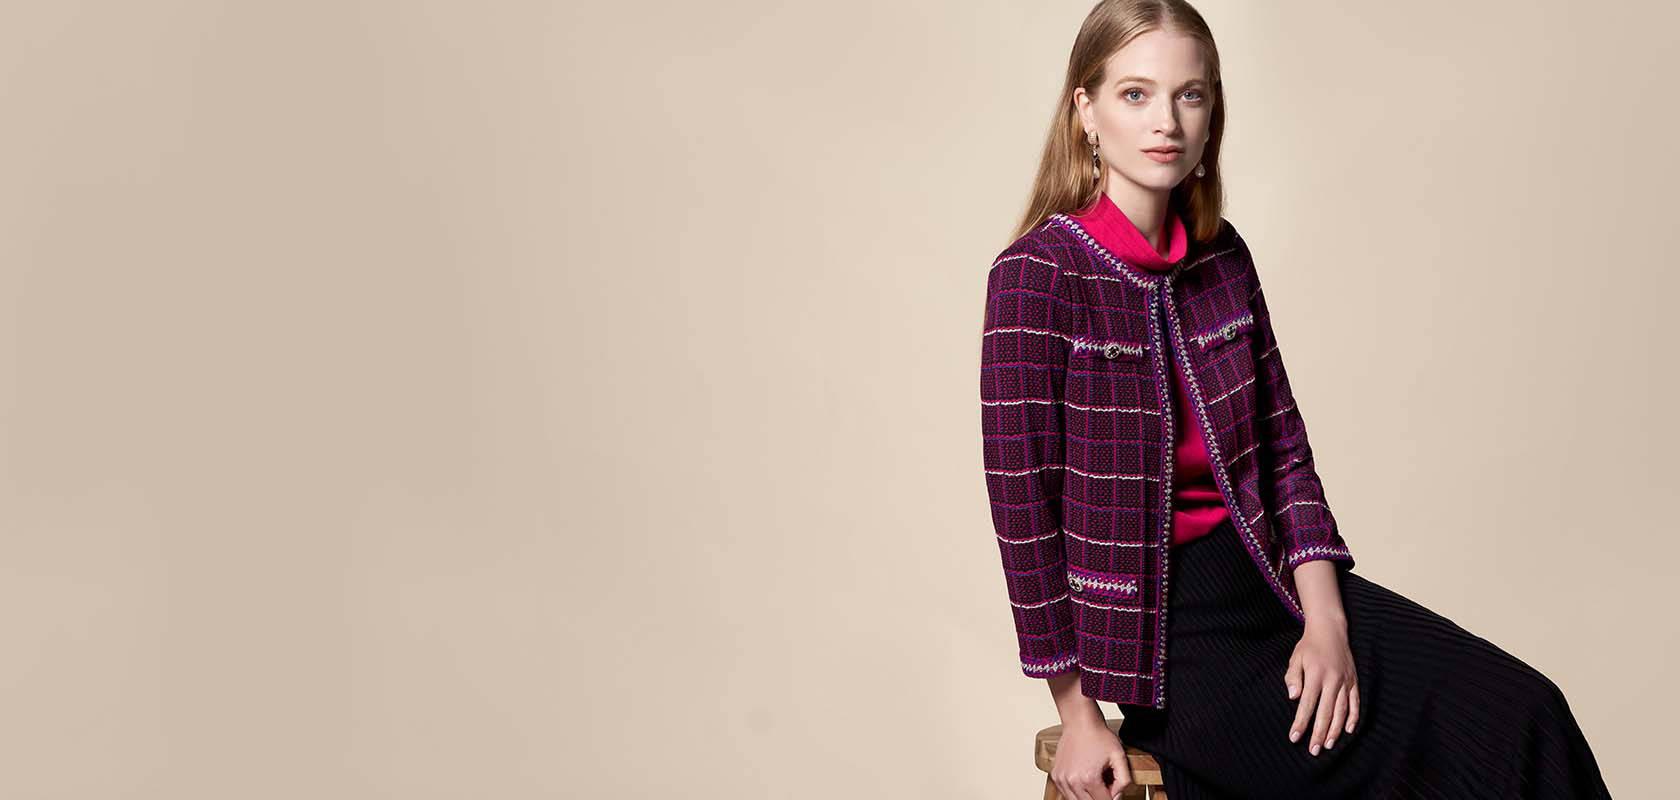 Crochet Accent Check Knit Jacket   Misook